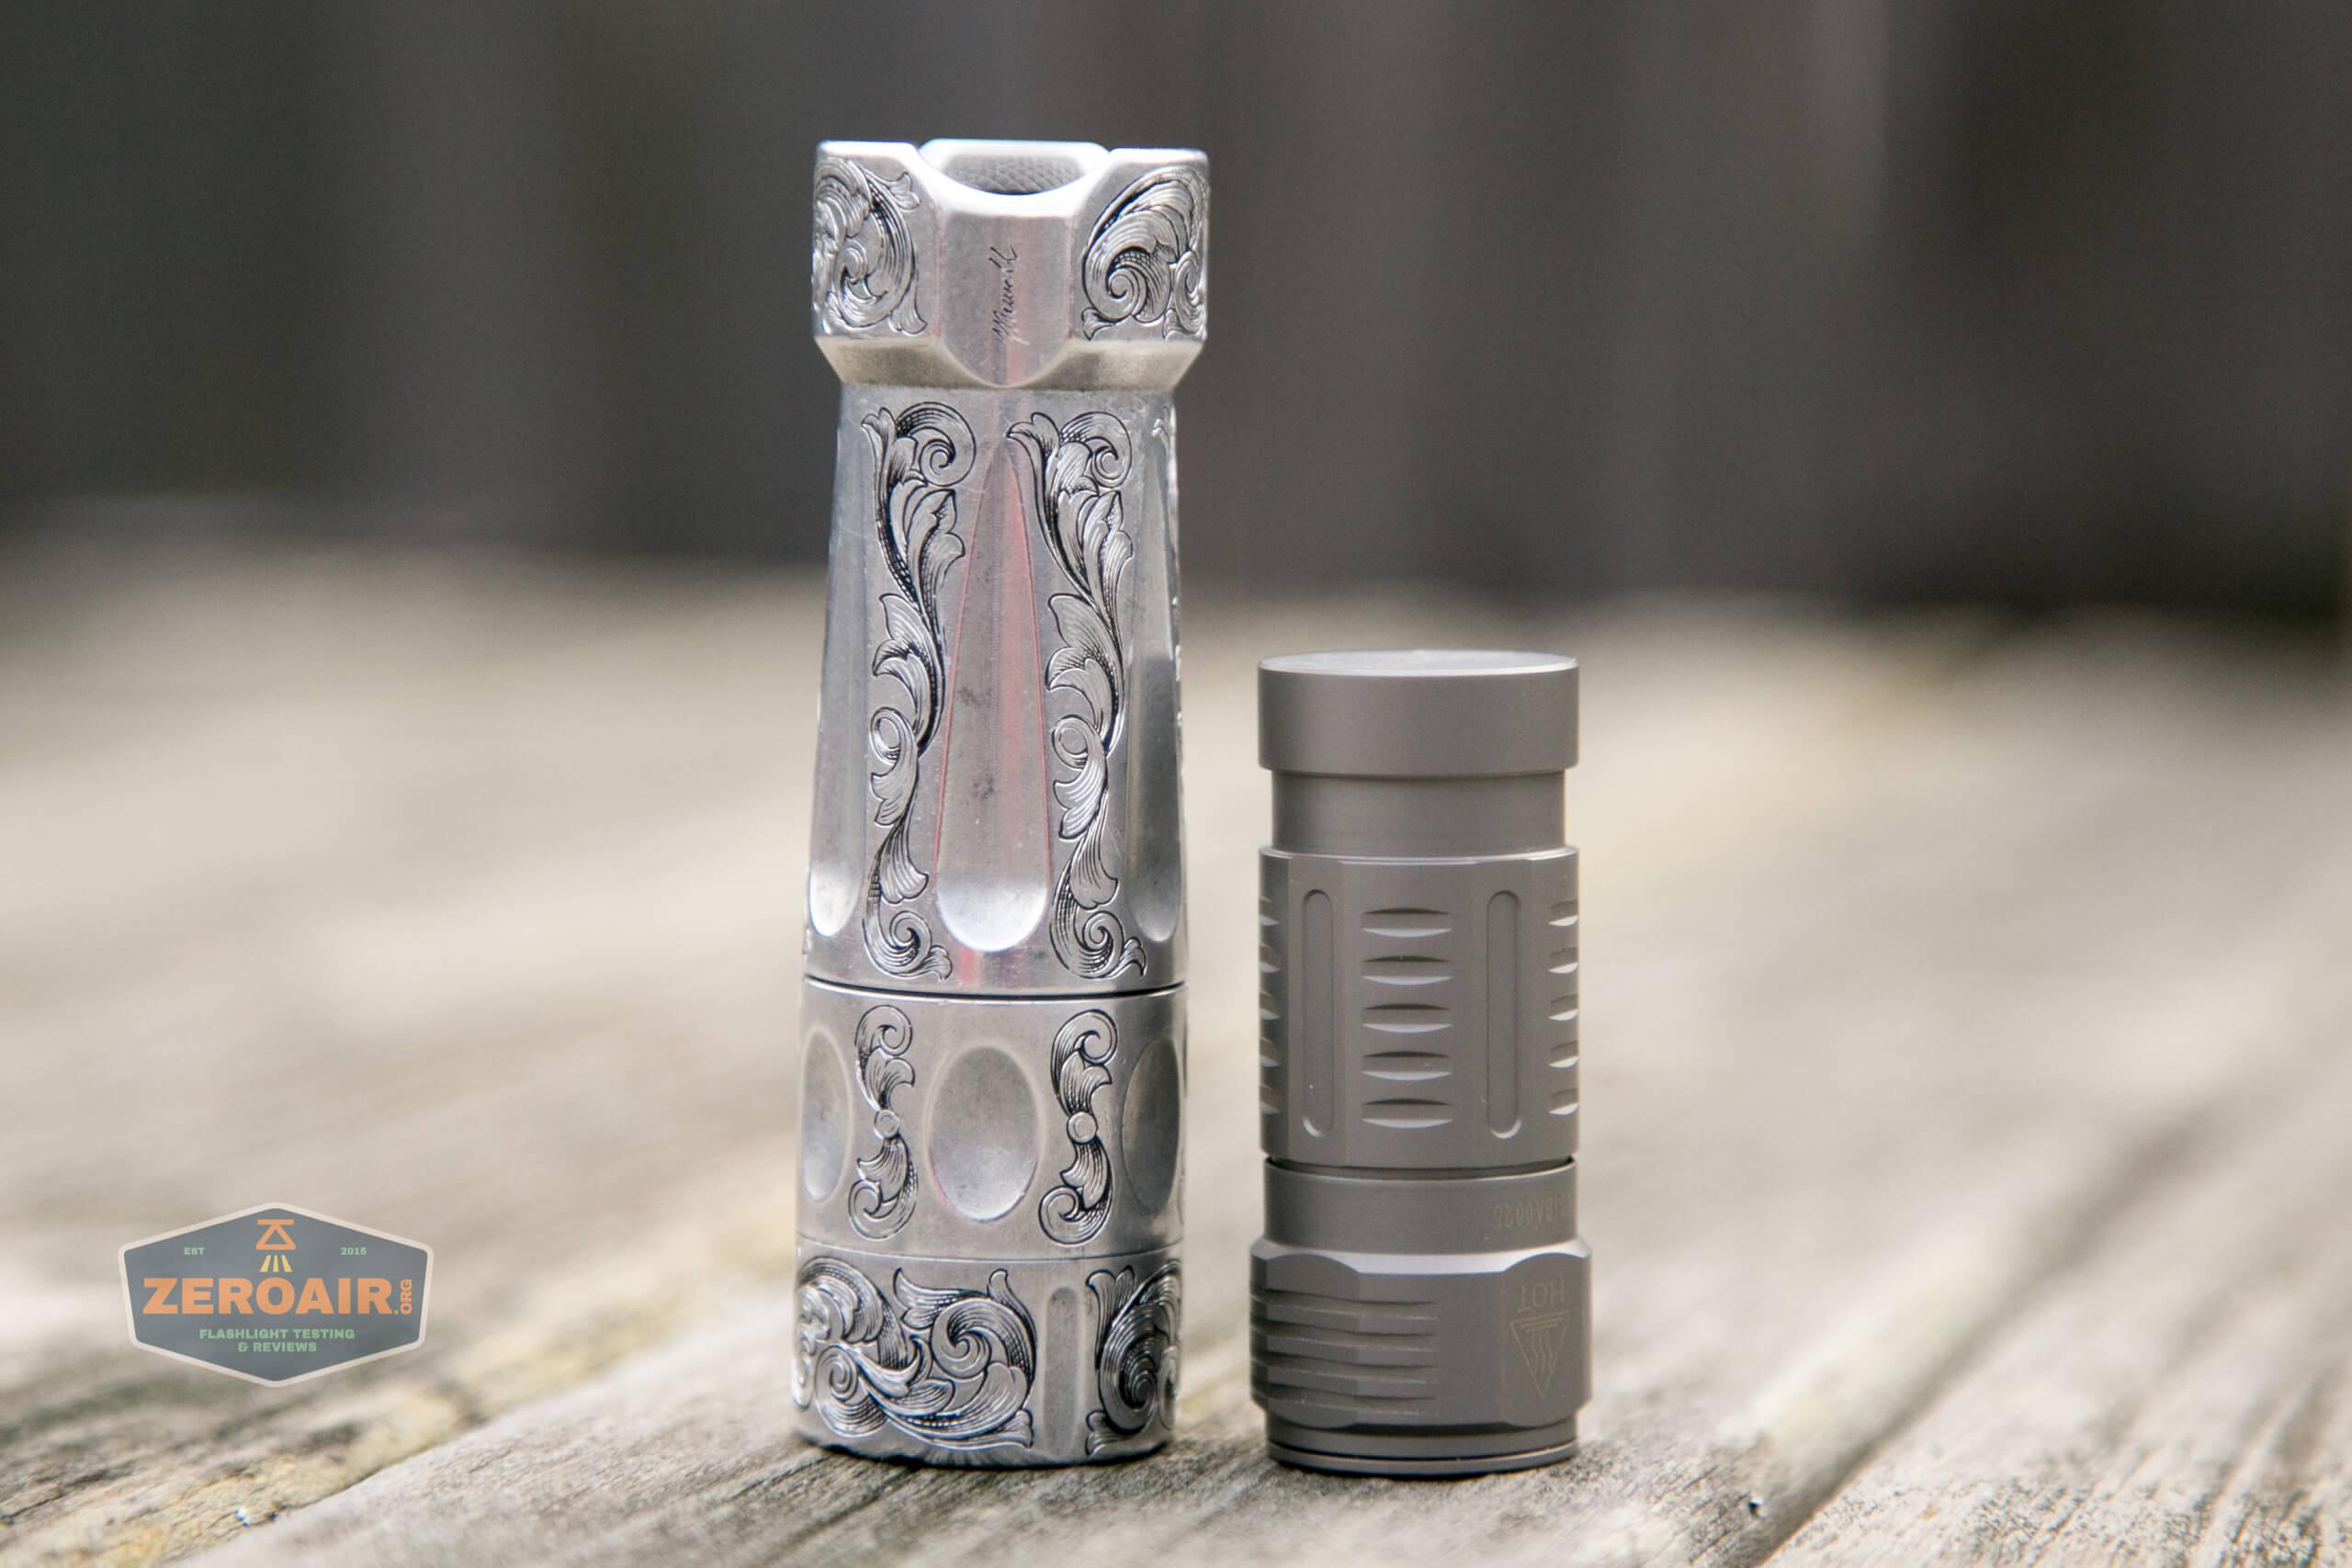 freasygears cyansky m3 titanium pocket flashlight beside torchlab boss 35